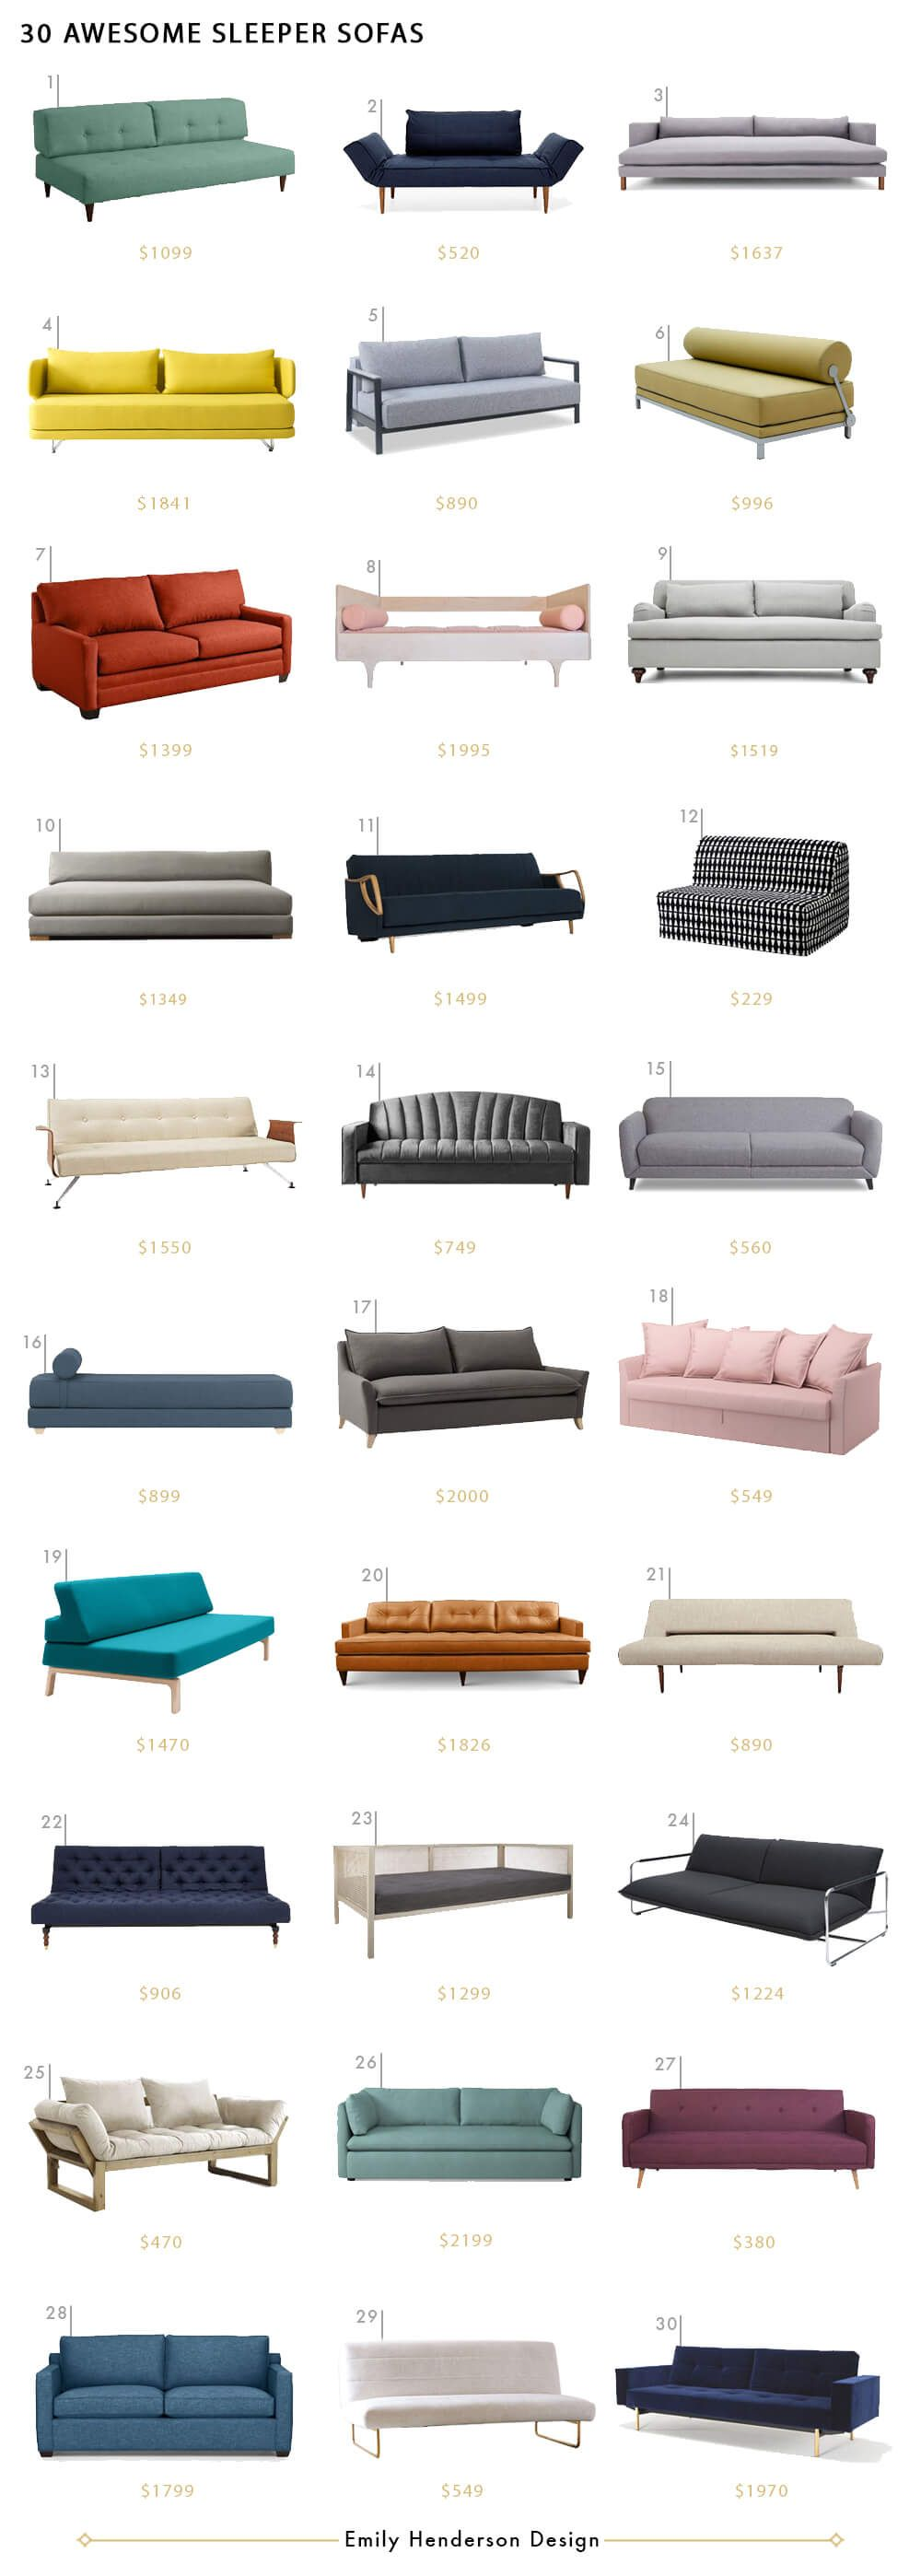 Diplomat sleeper sofa fold down sleeper sofa blu dot in modern sleeper - Best 25 Sleeper Sofas Ideas On Pinterest Sleeper Sofa Twin Sleeper Sofa And Sleeper Couch